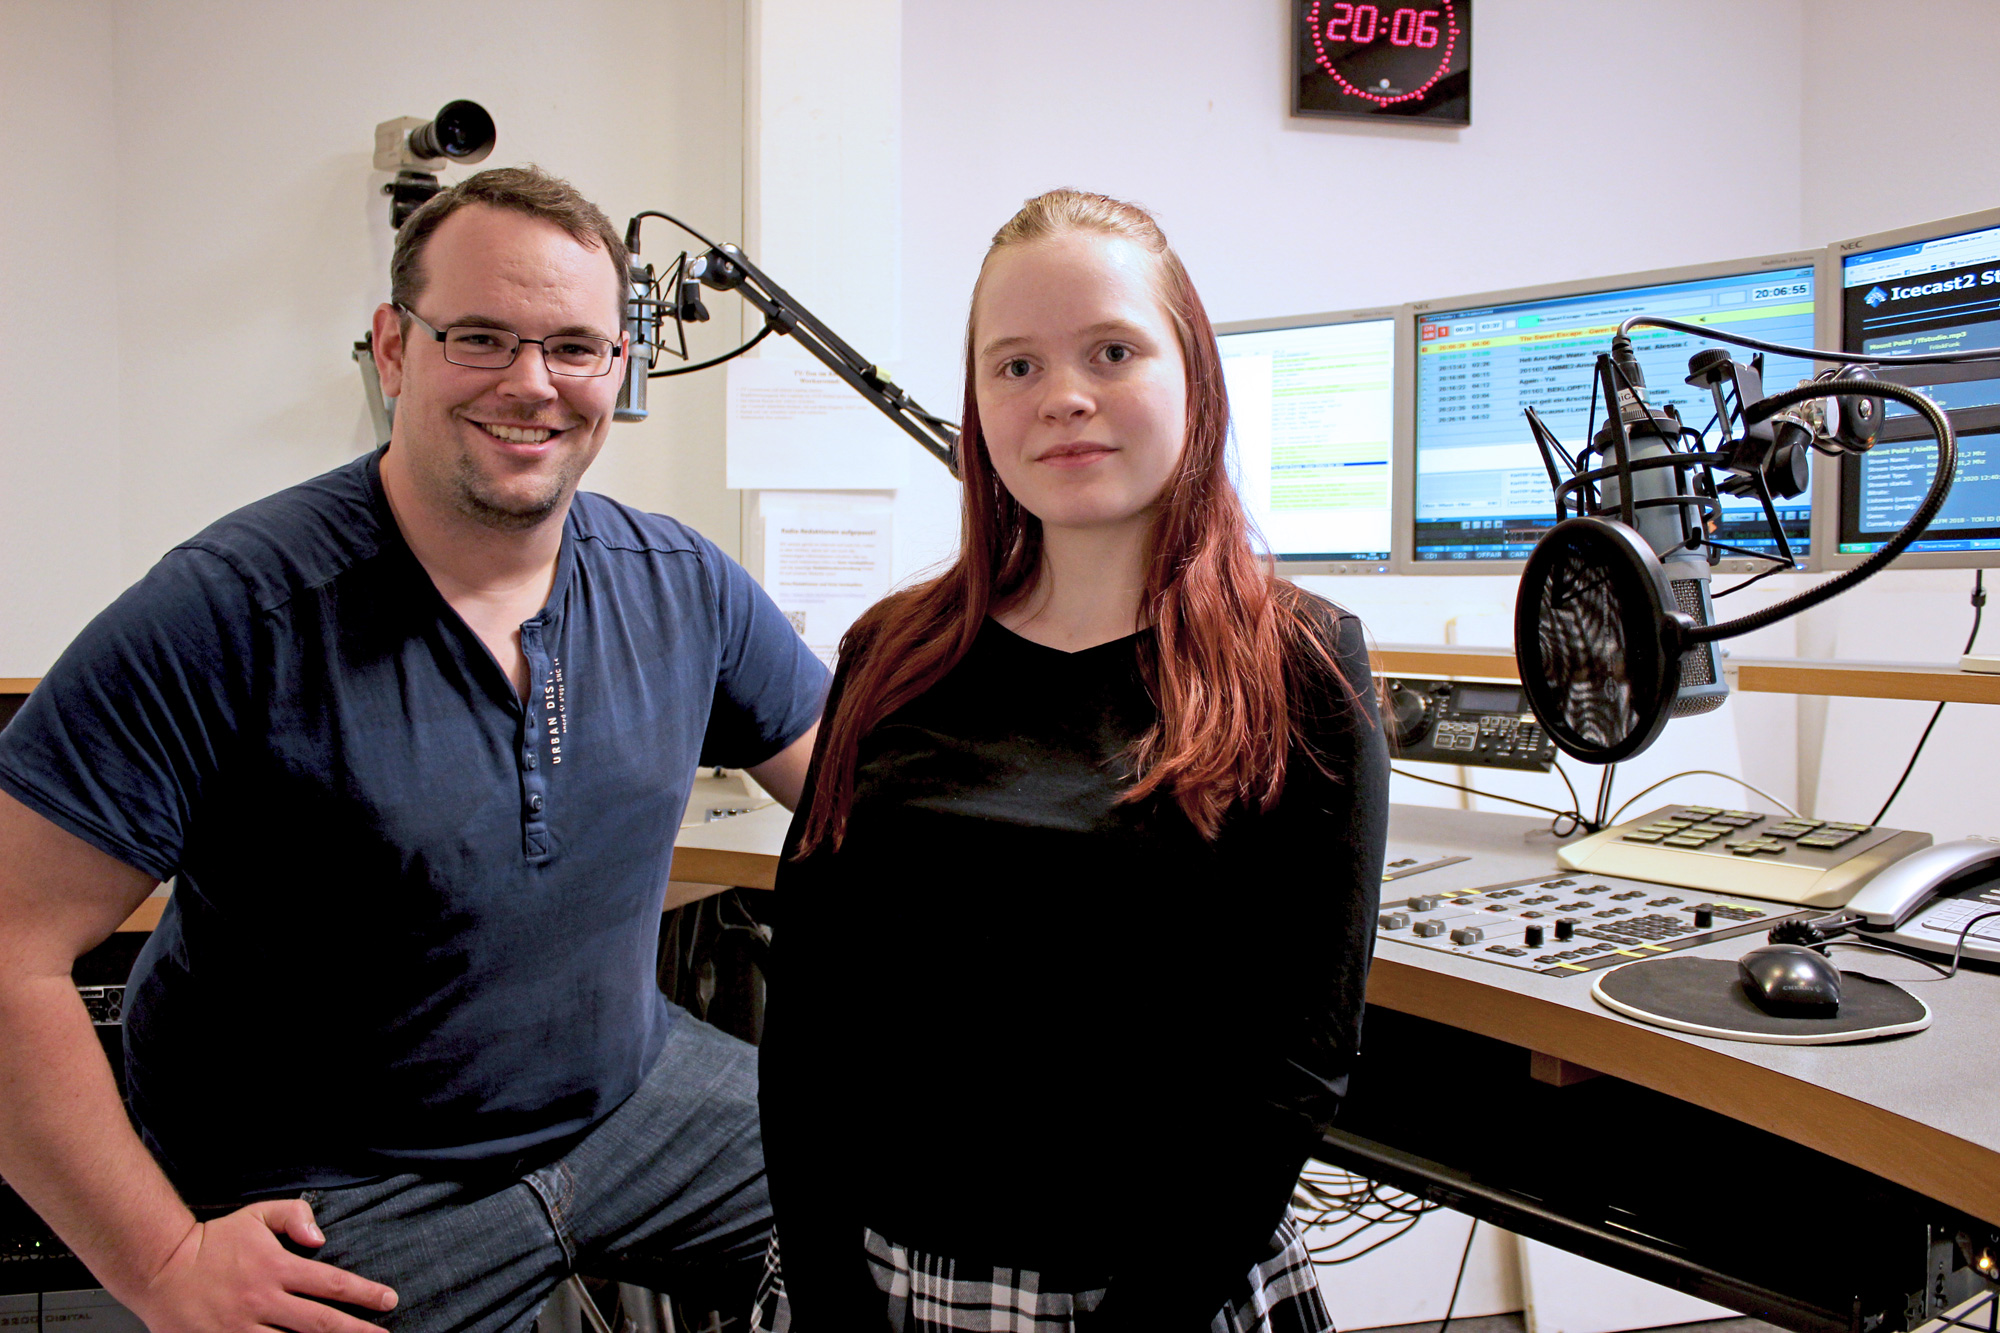 Erik & Madita im Radiostudio - November 2020